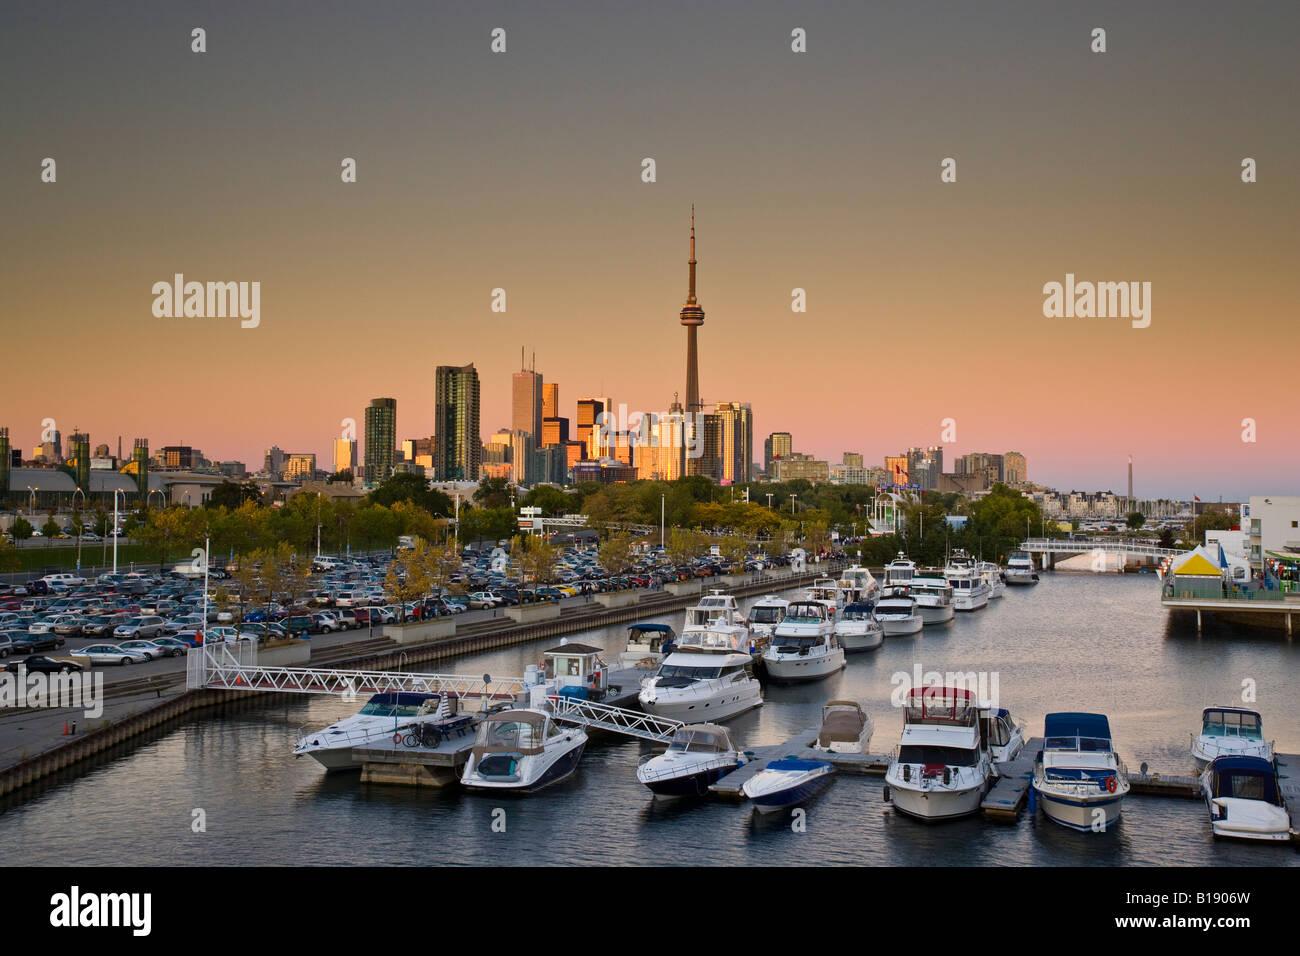 Lo skyline di Toronto e Ontario Place al tramonto, Toronto, Ontario, Canada. Immagini Stock